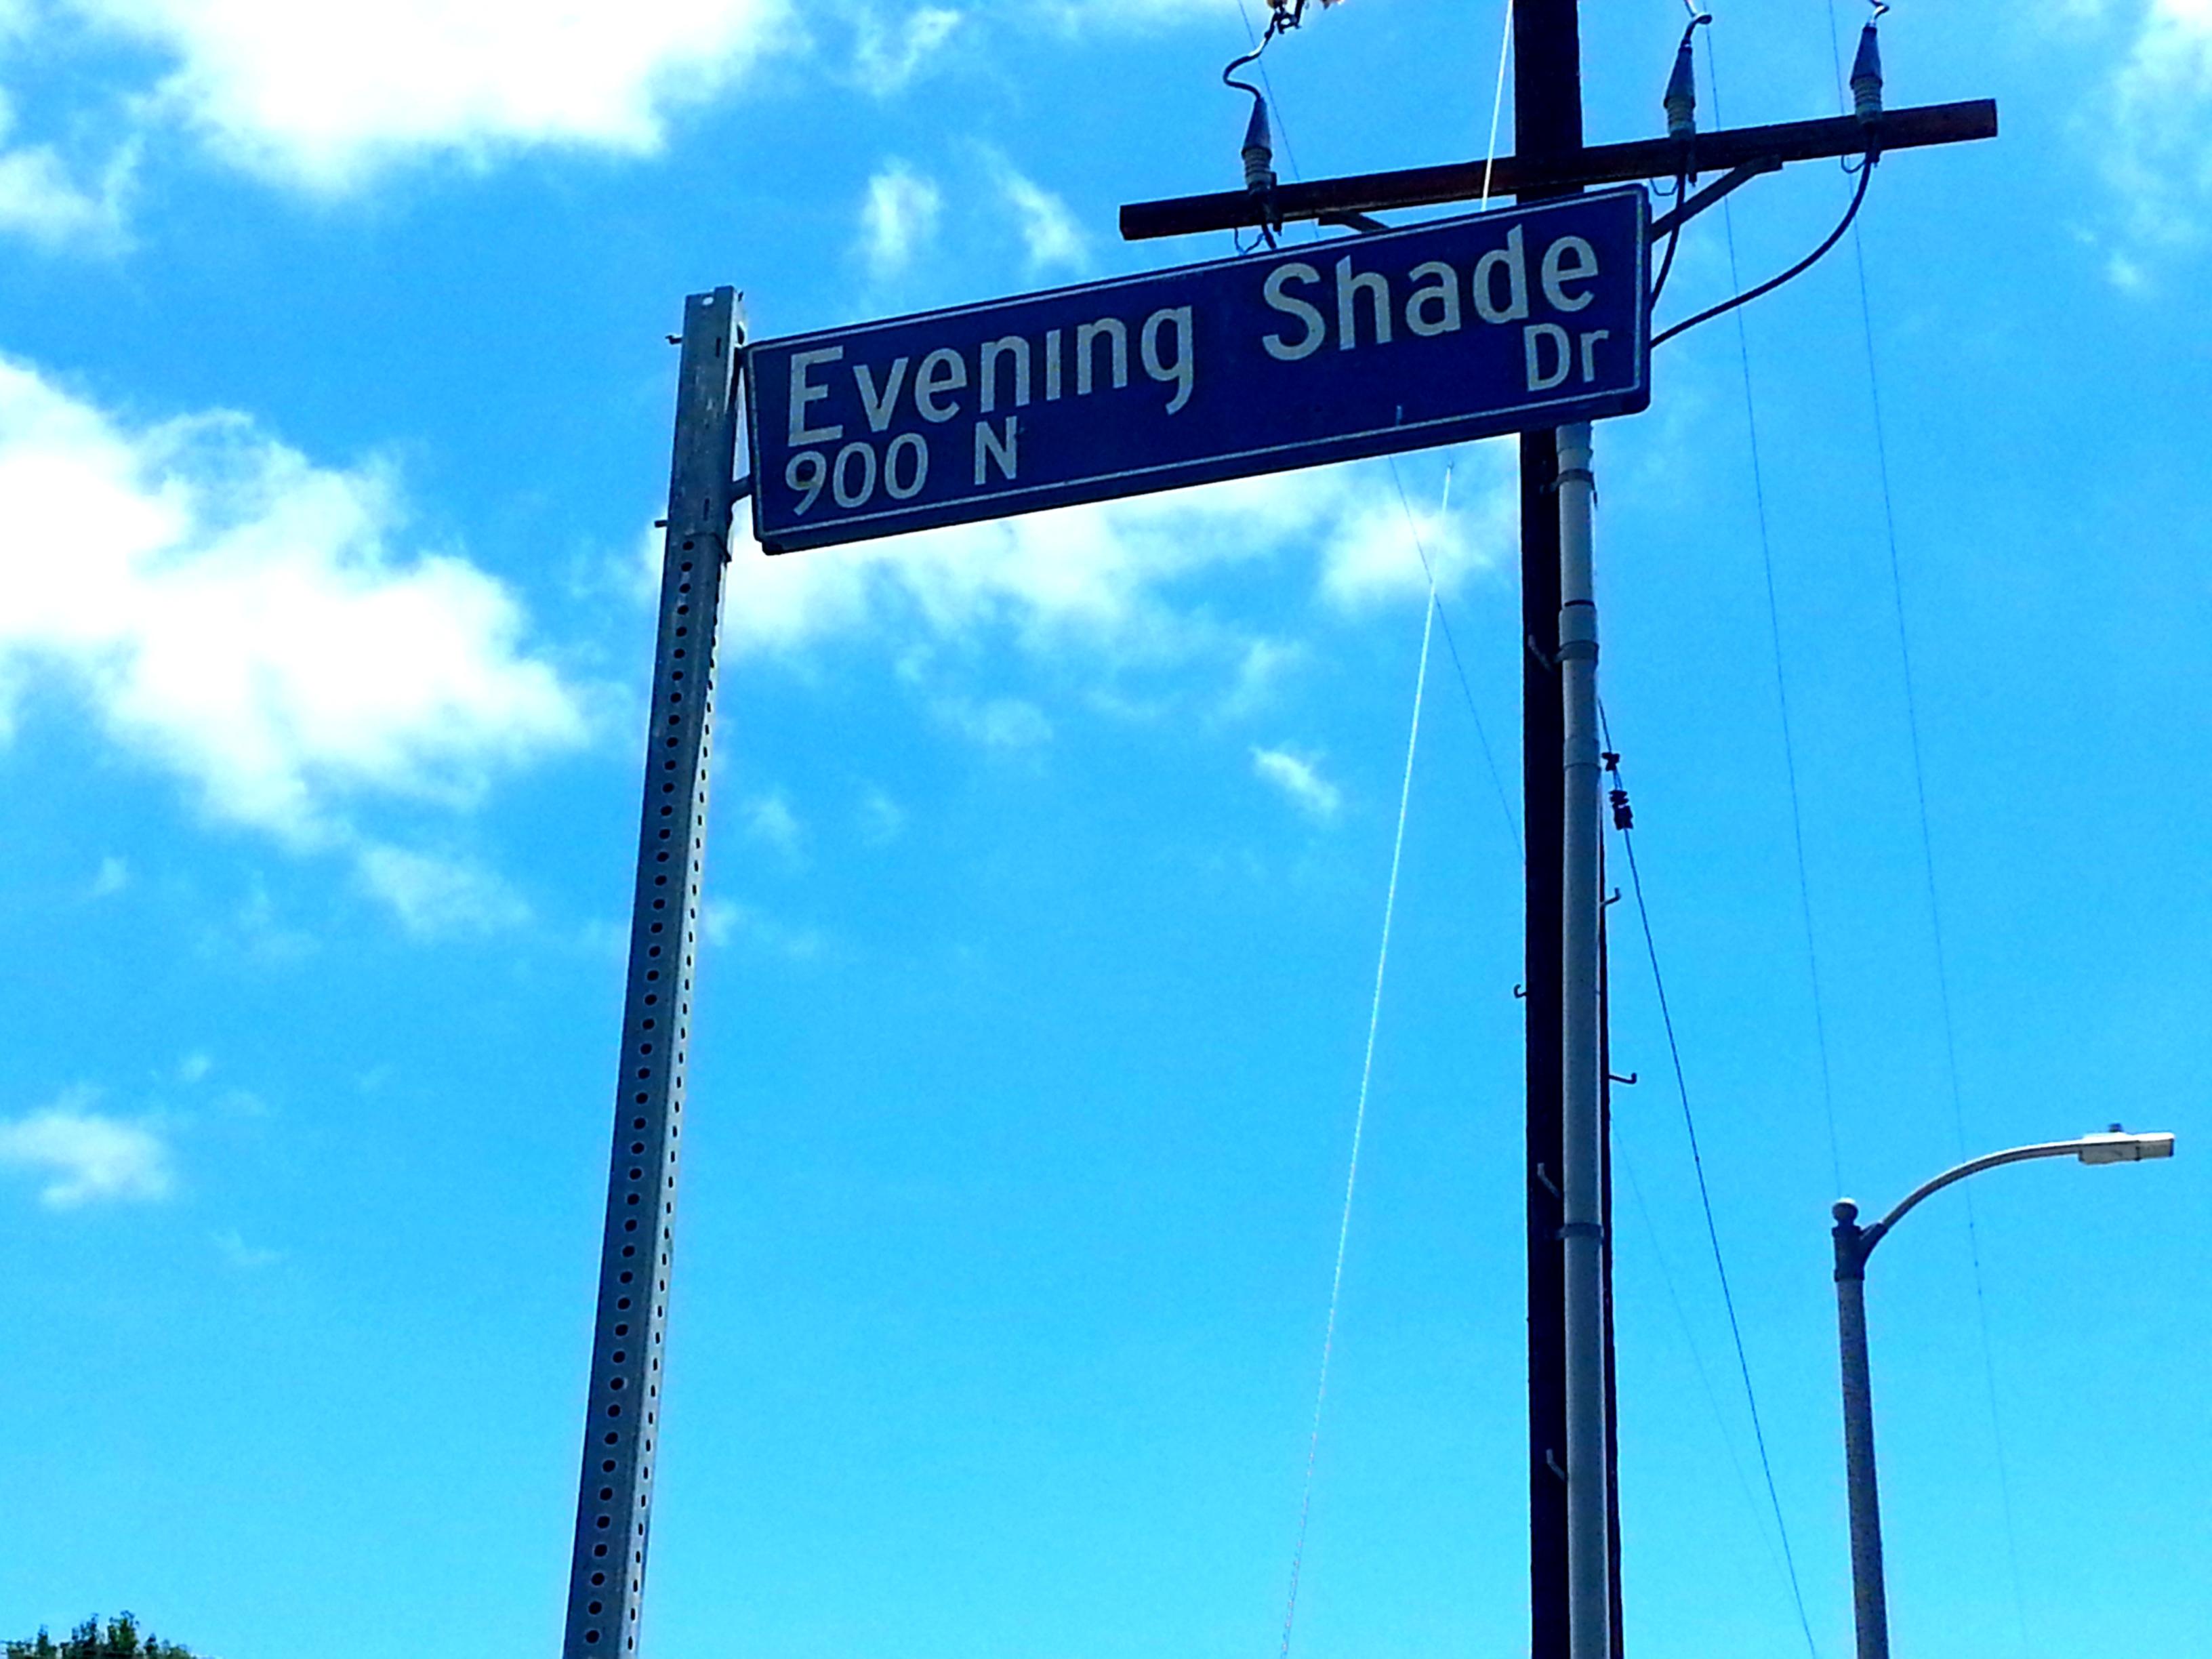 Evening Shade